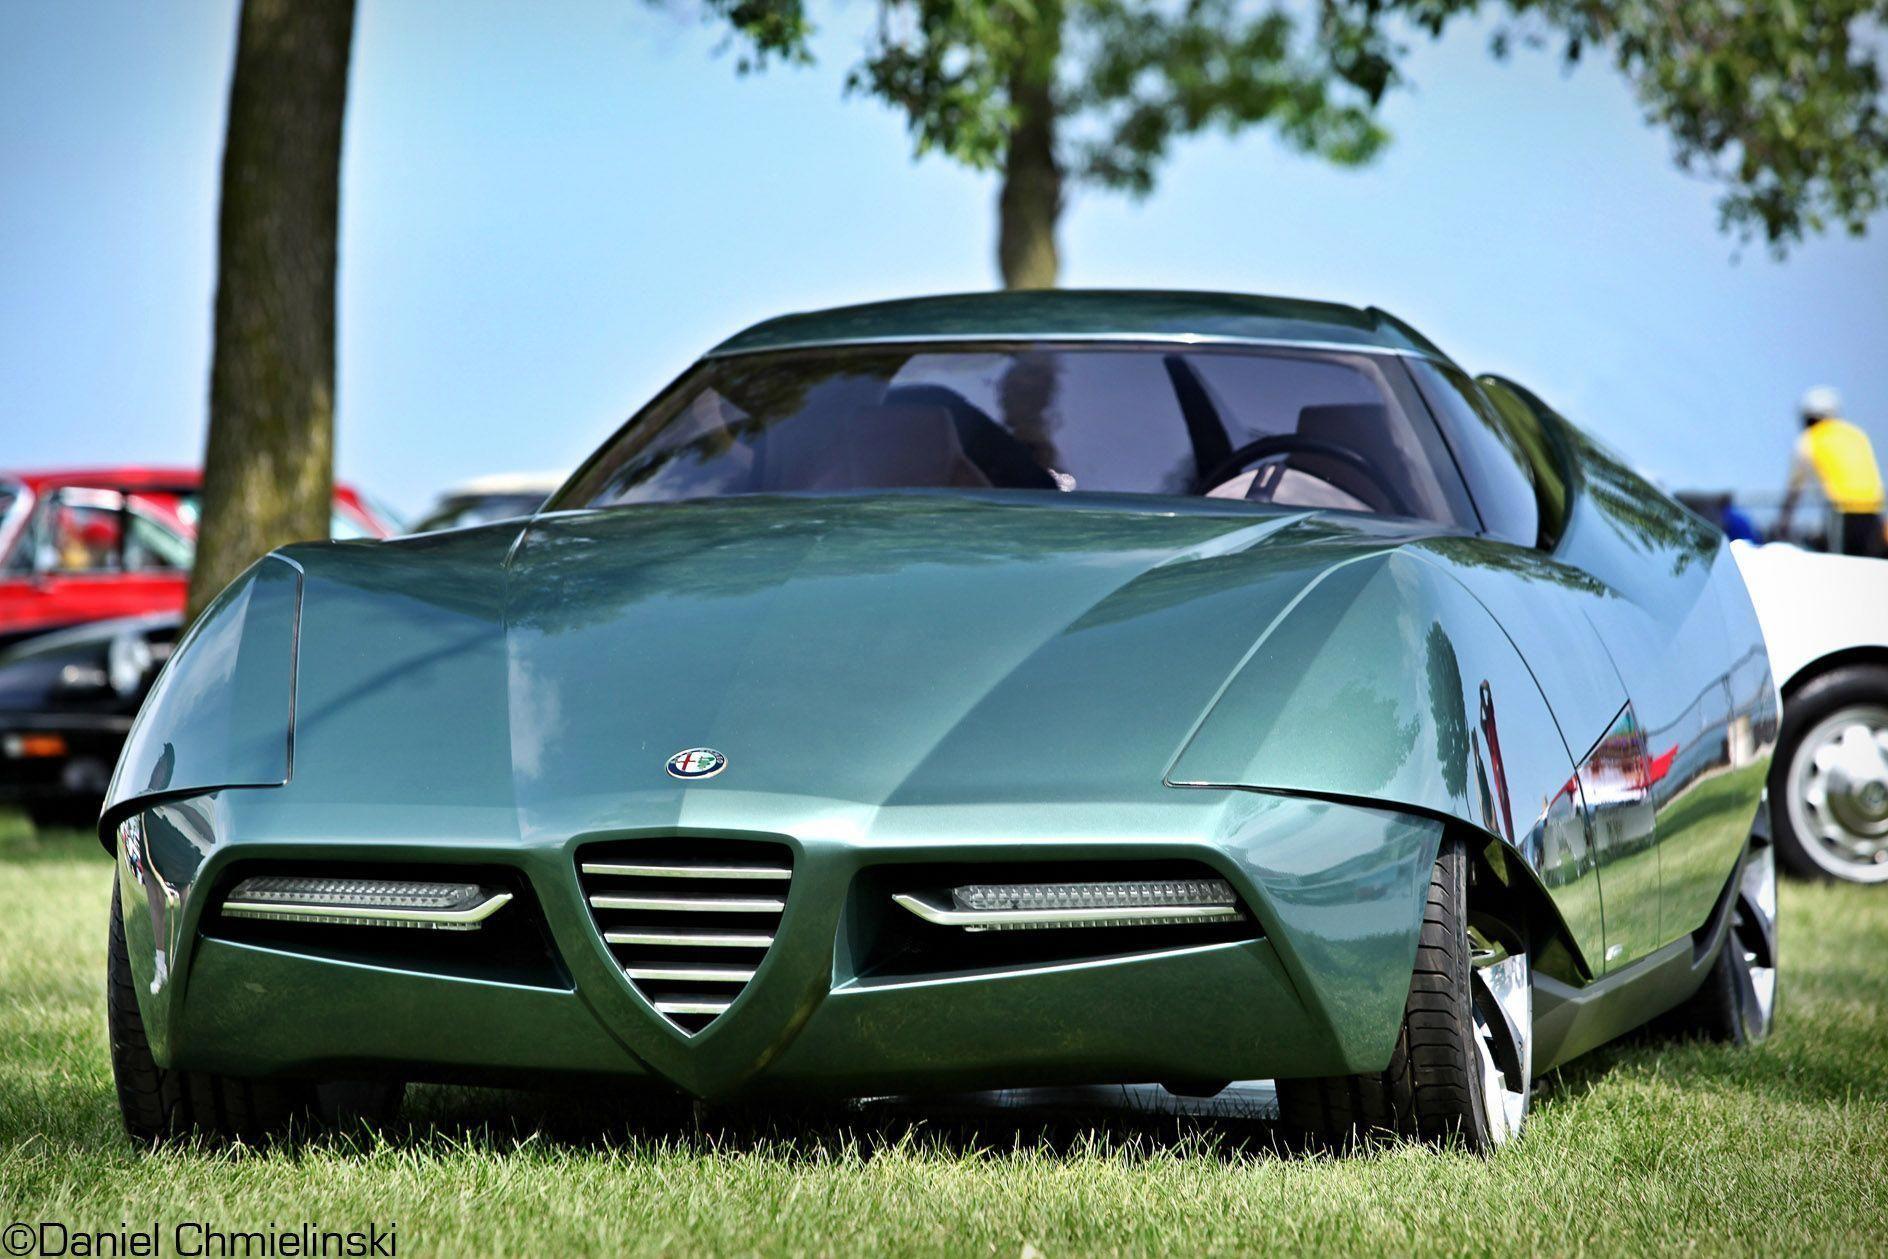 New Alfa Romeo GTV Concept render